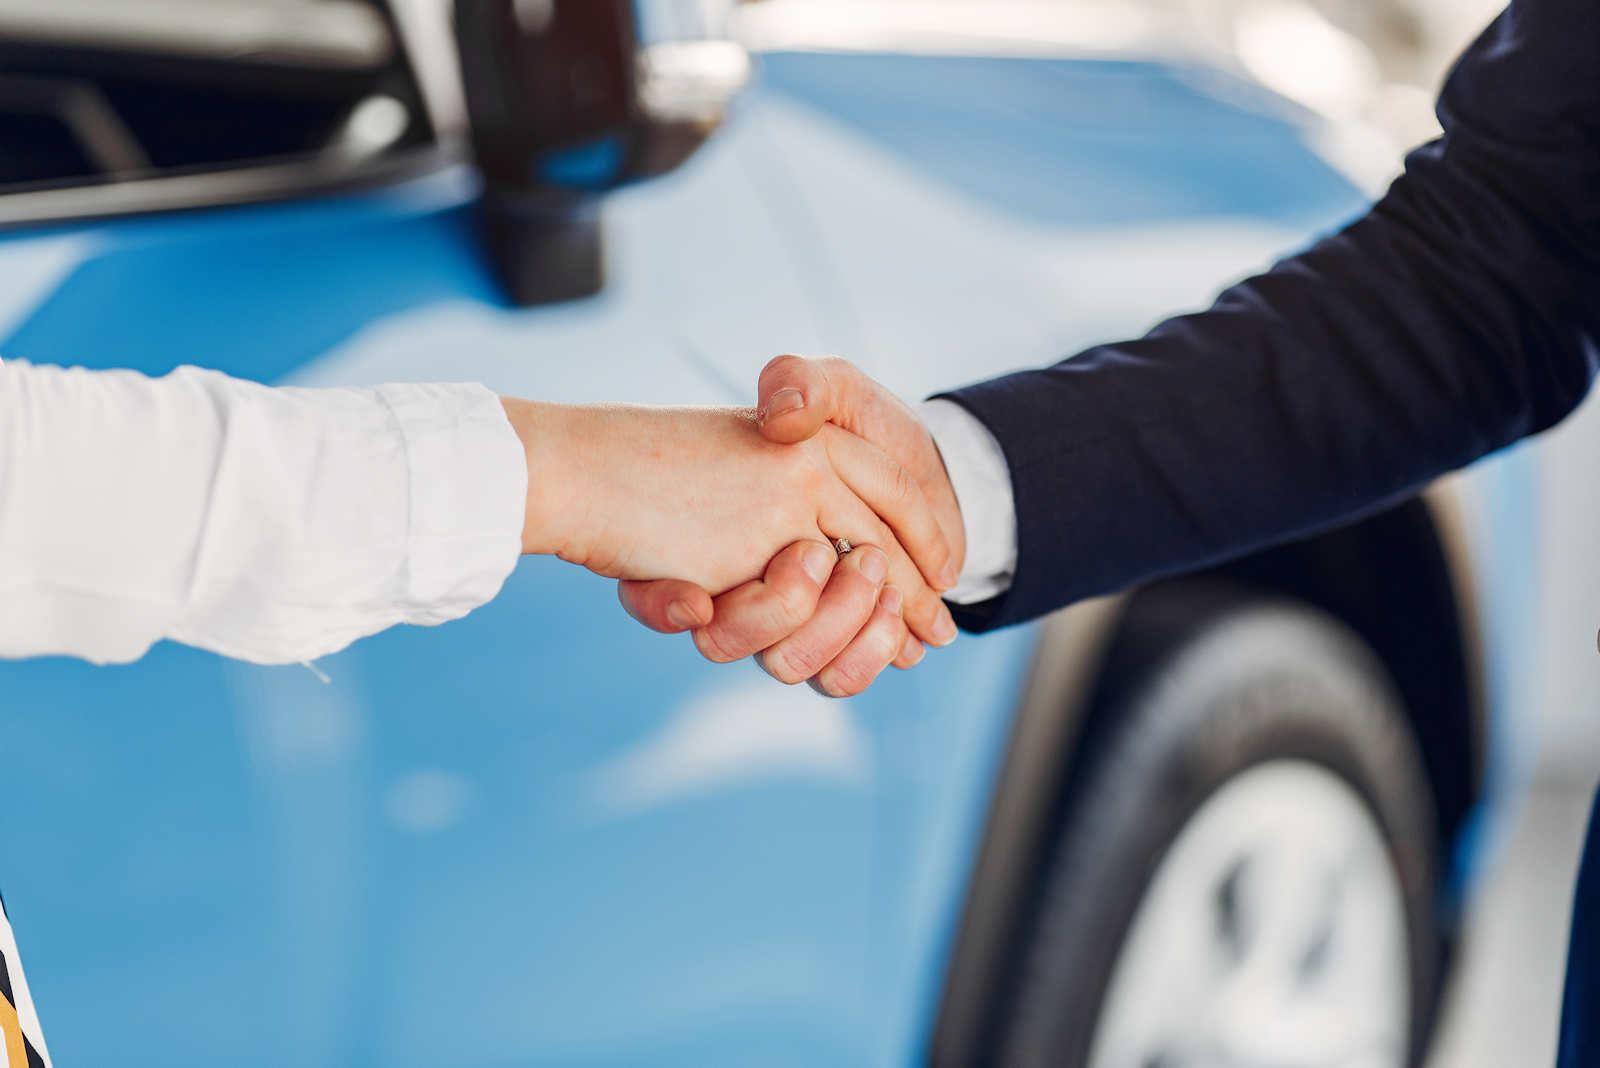 Enterprise Rent-A-Car in New Rochelle